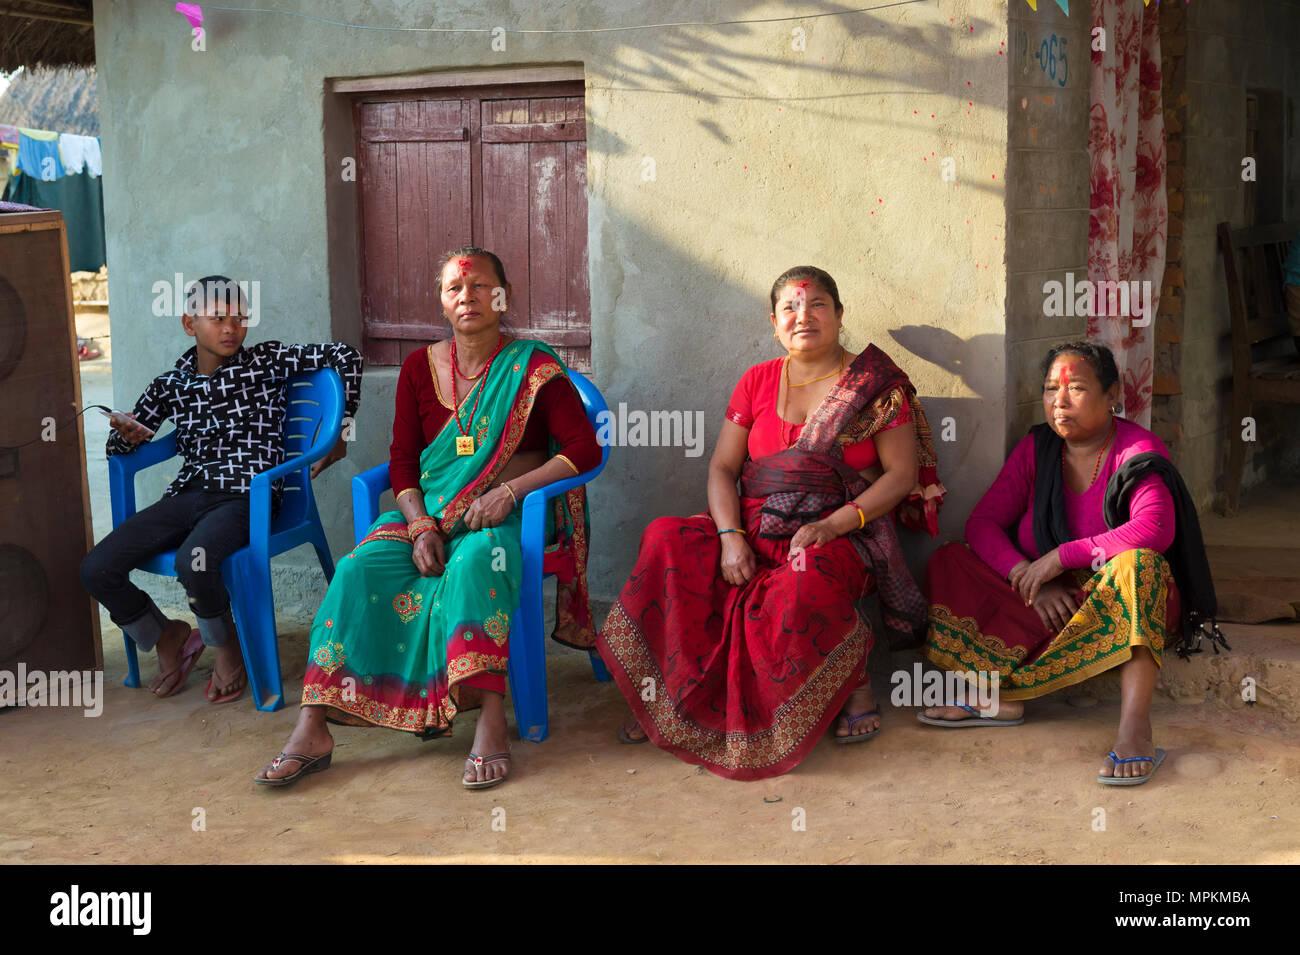 Matrimonio In Nepal : Matrimonio nepalese immagini & matrimonio nepalese fotos stock alamy